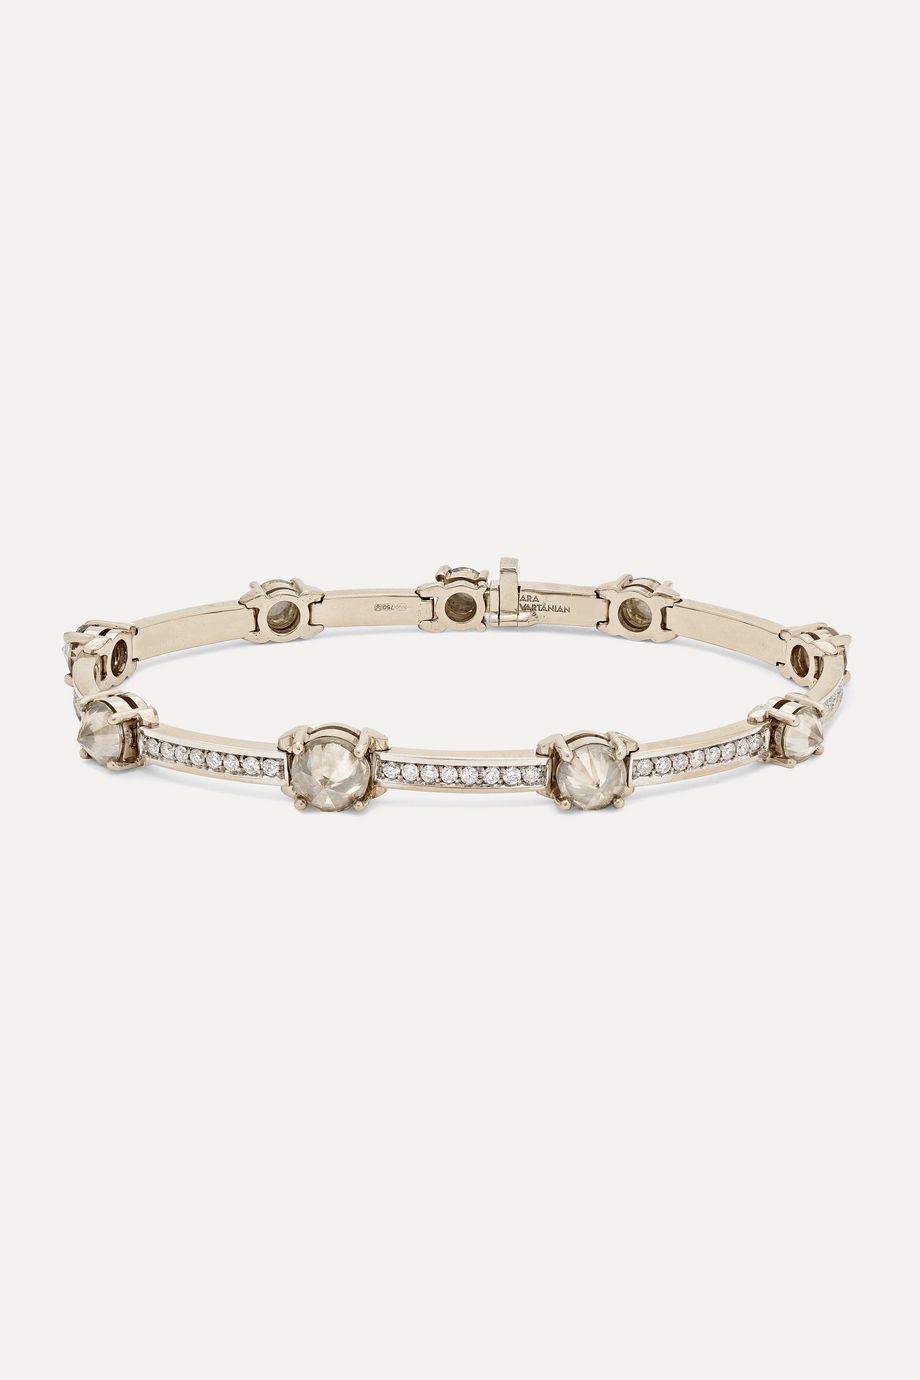 Ara Vartanian Armband aus 18Karat Weißgold mit Diamanten